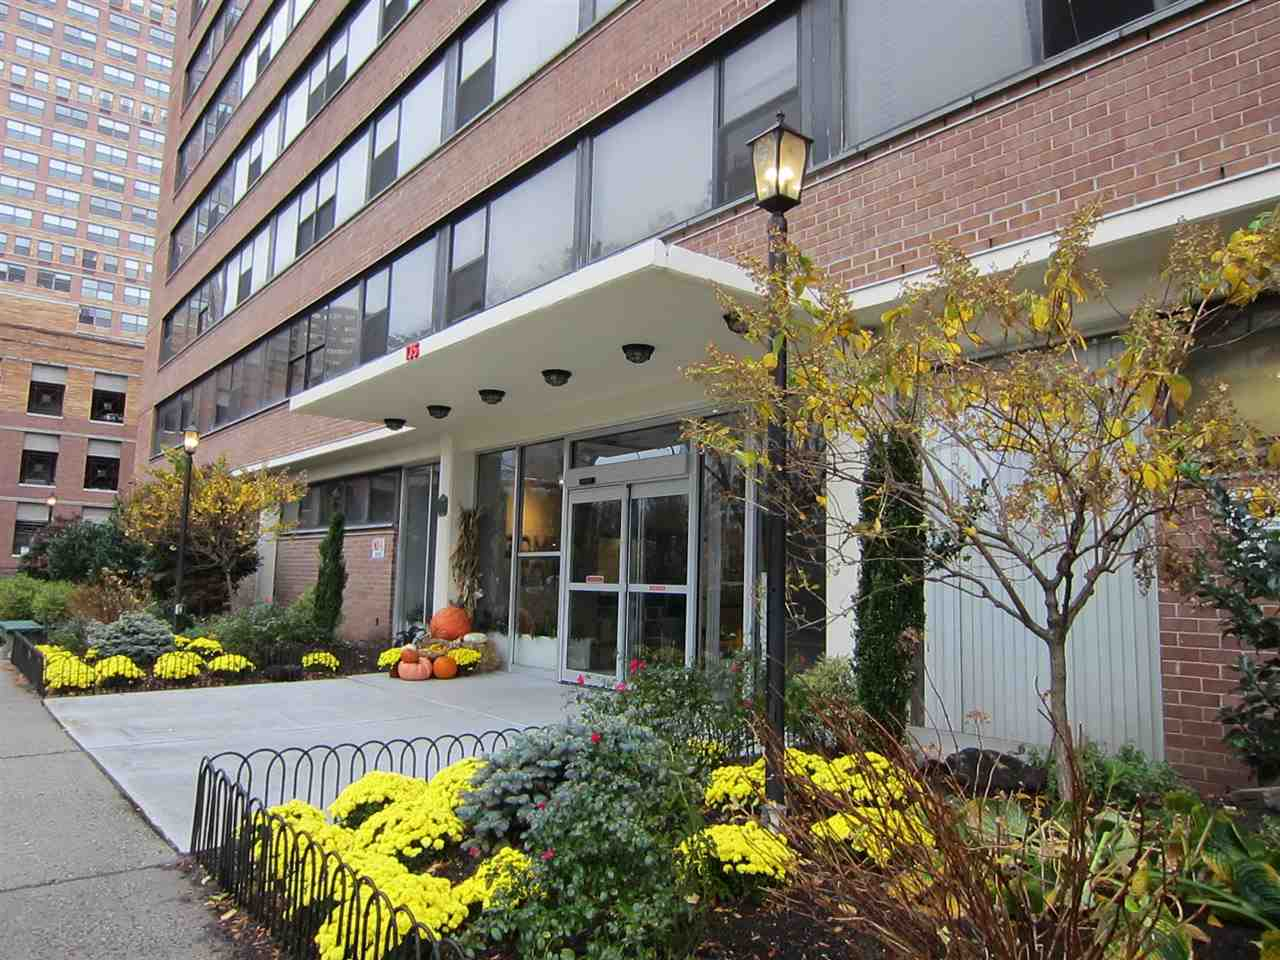 135 MONTGOMERY ST 10 H, JC, Downtown, NJ 07302